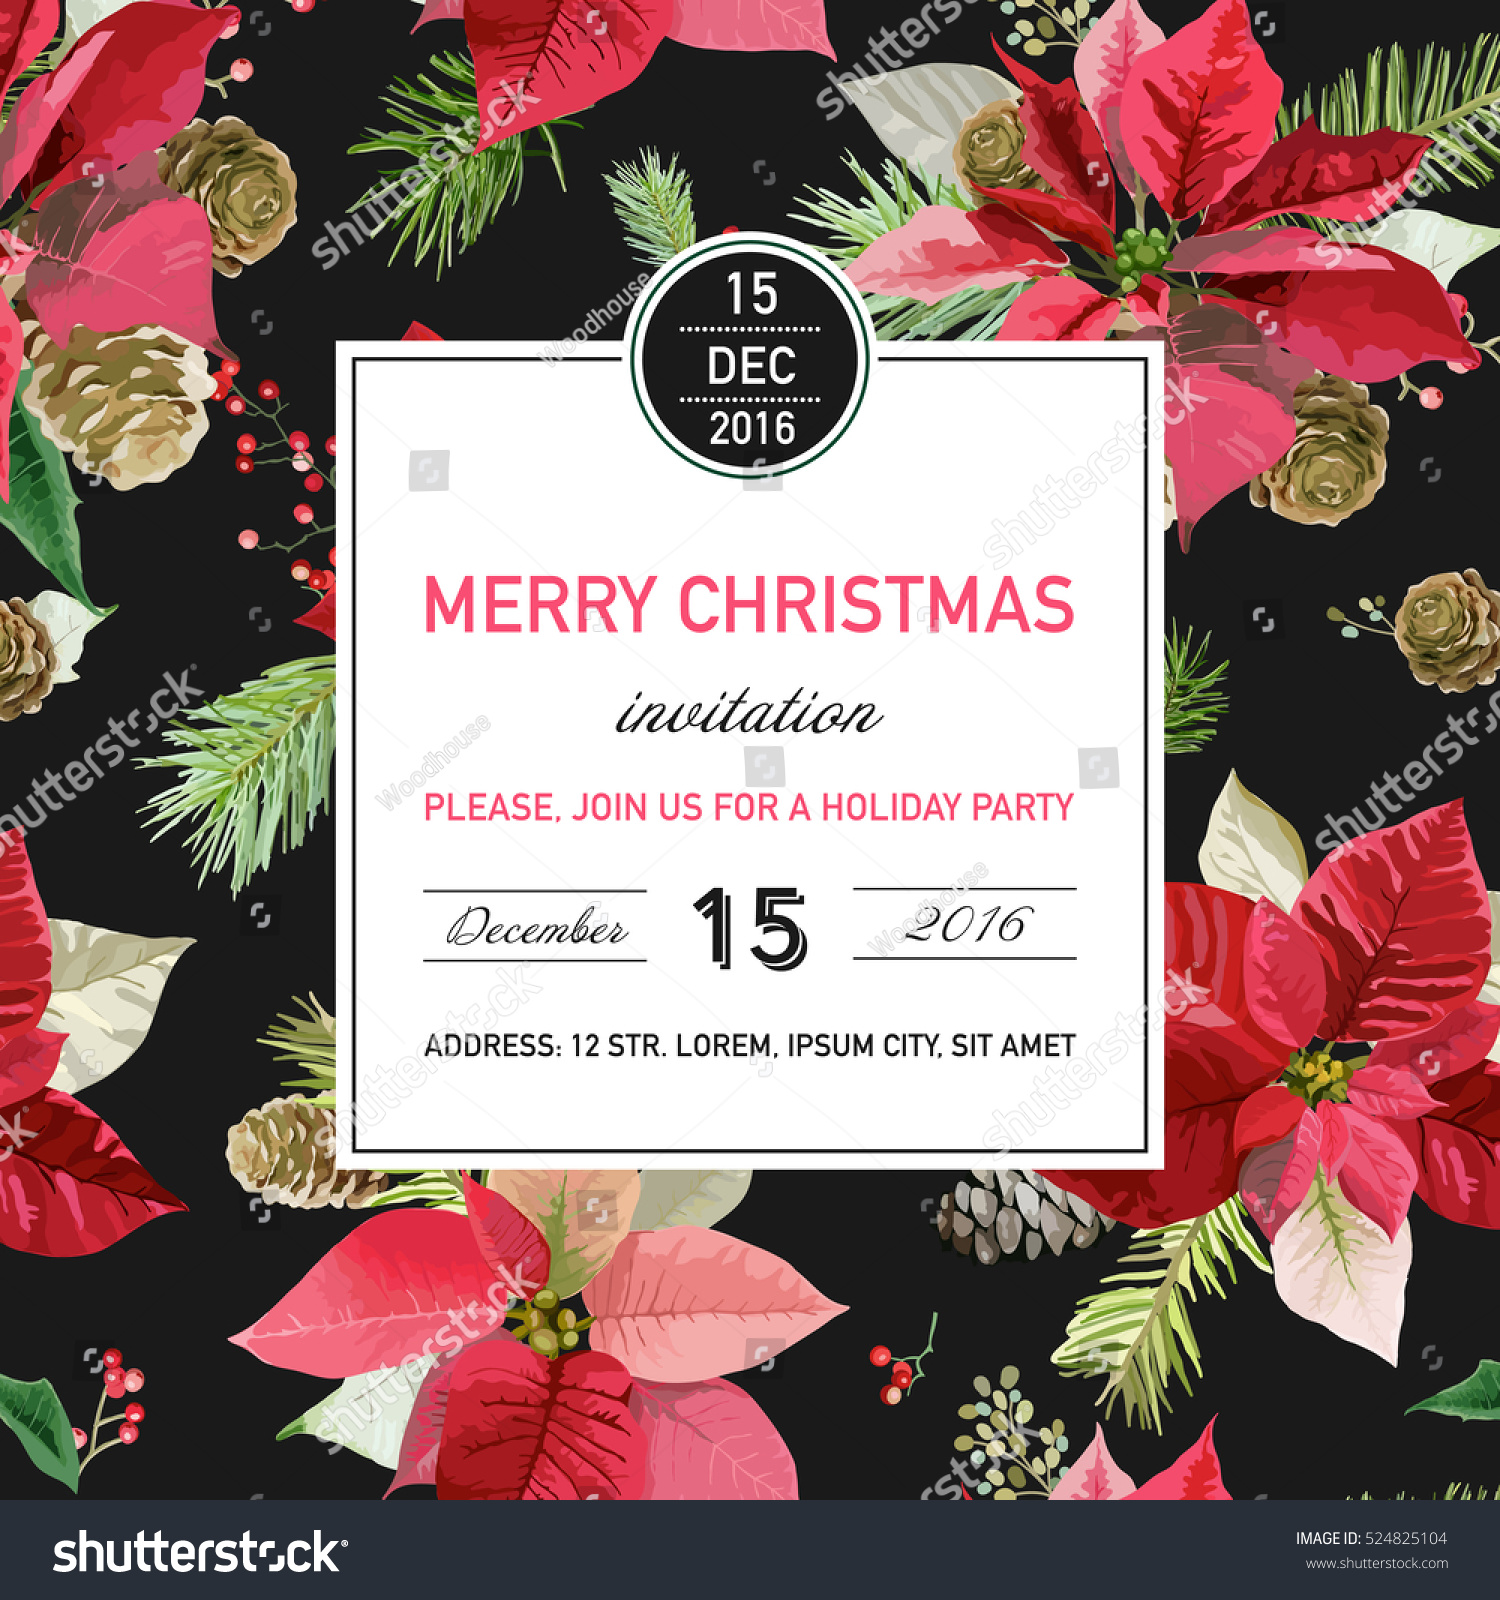 Vintage poinsettia christmas invitation card winter stock vector vintage poinsettia christmas invitation card winter background poster design vector stopboris Images